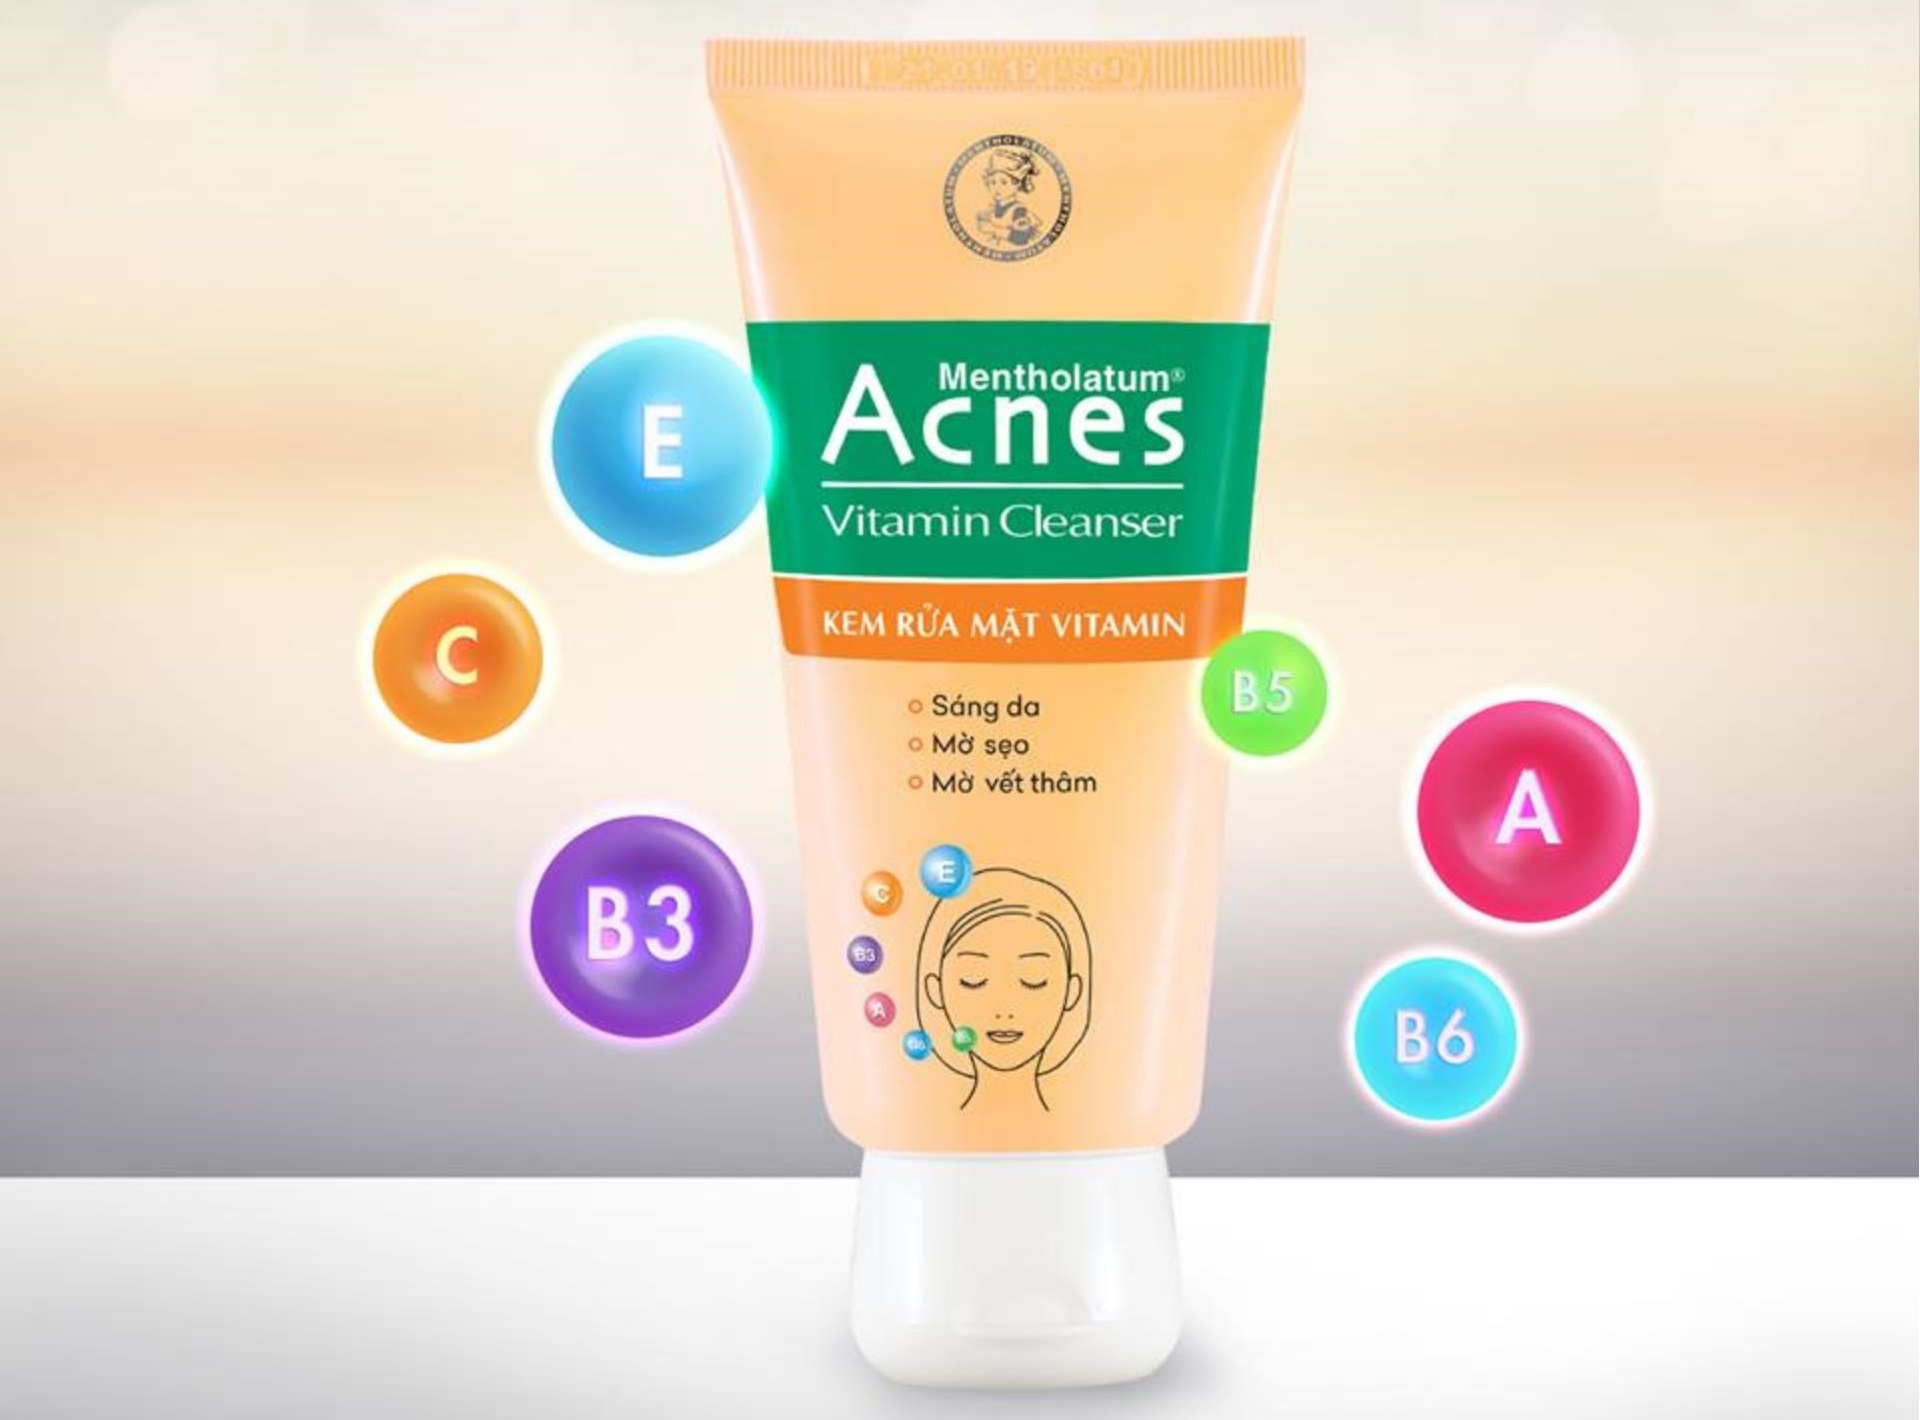 Sữa rửa mặt nghệ Acnes Vitamin Cleanser